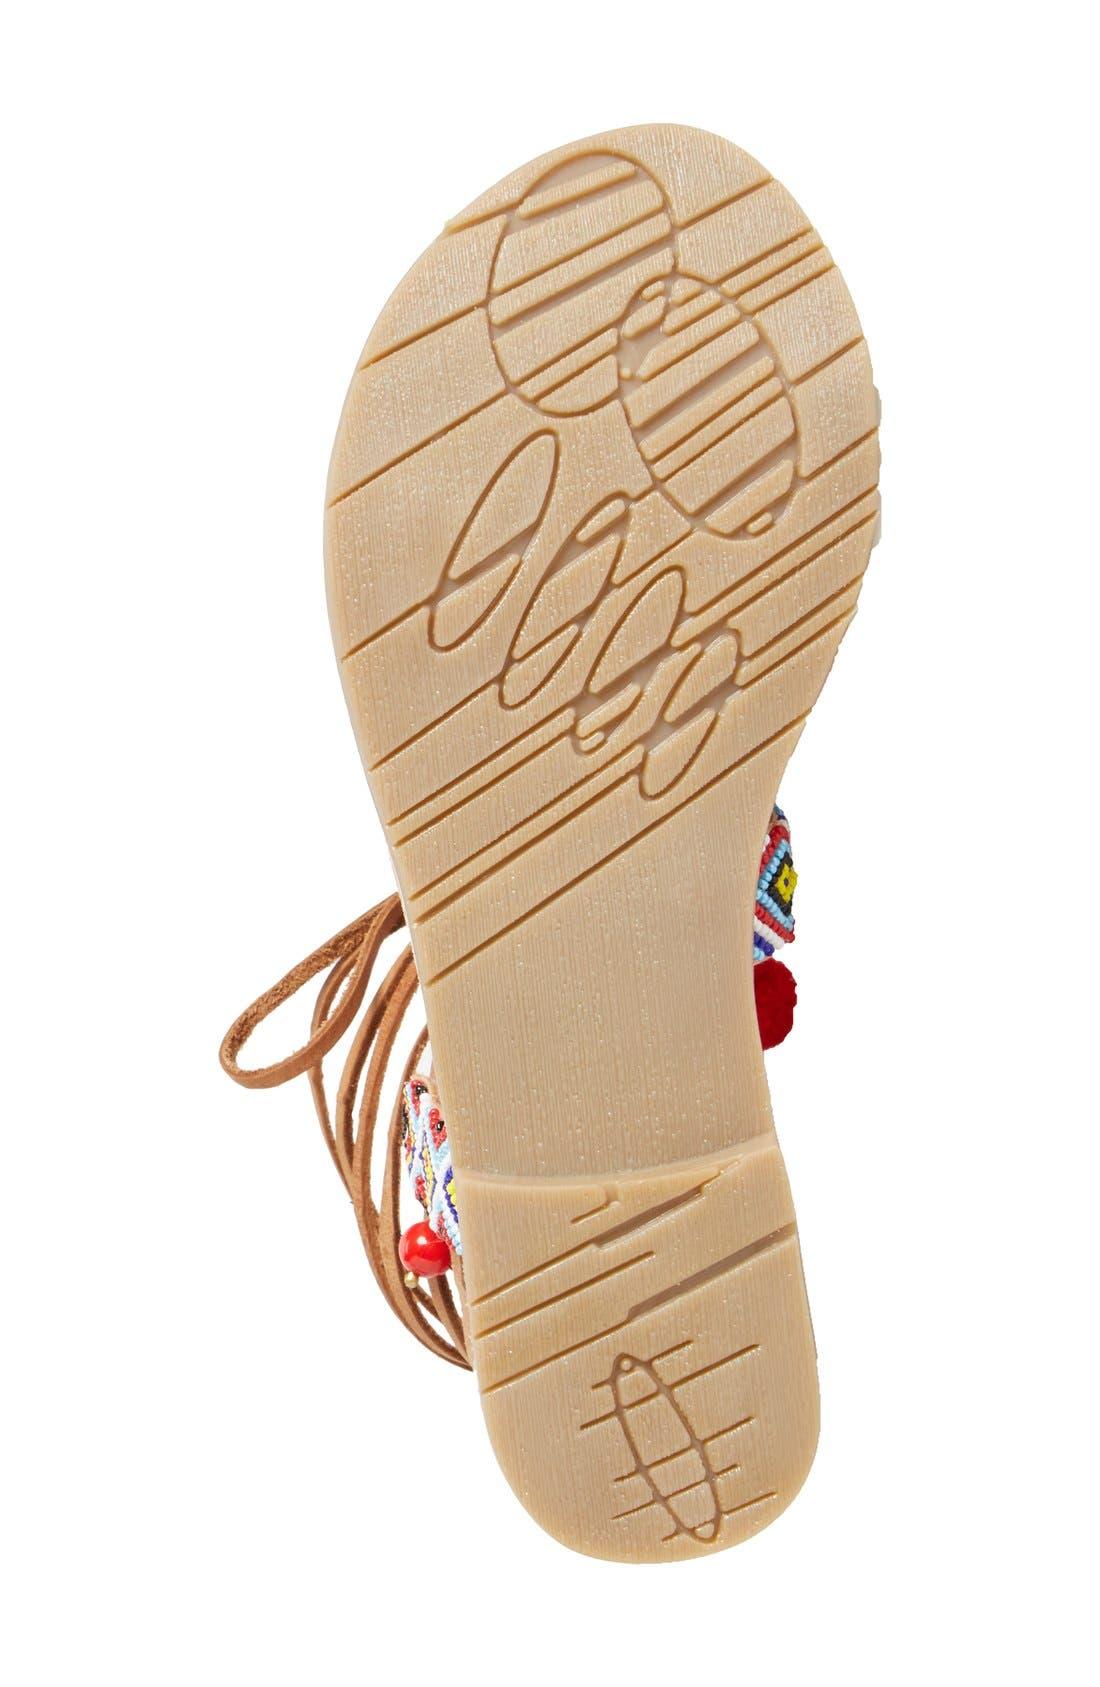 CHINESE LAUNDRY, 'Posh' Embellished Lace-Up Sandal, Alternate thumbnail 4, color, 218